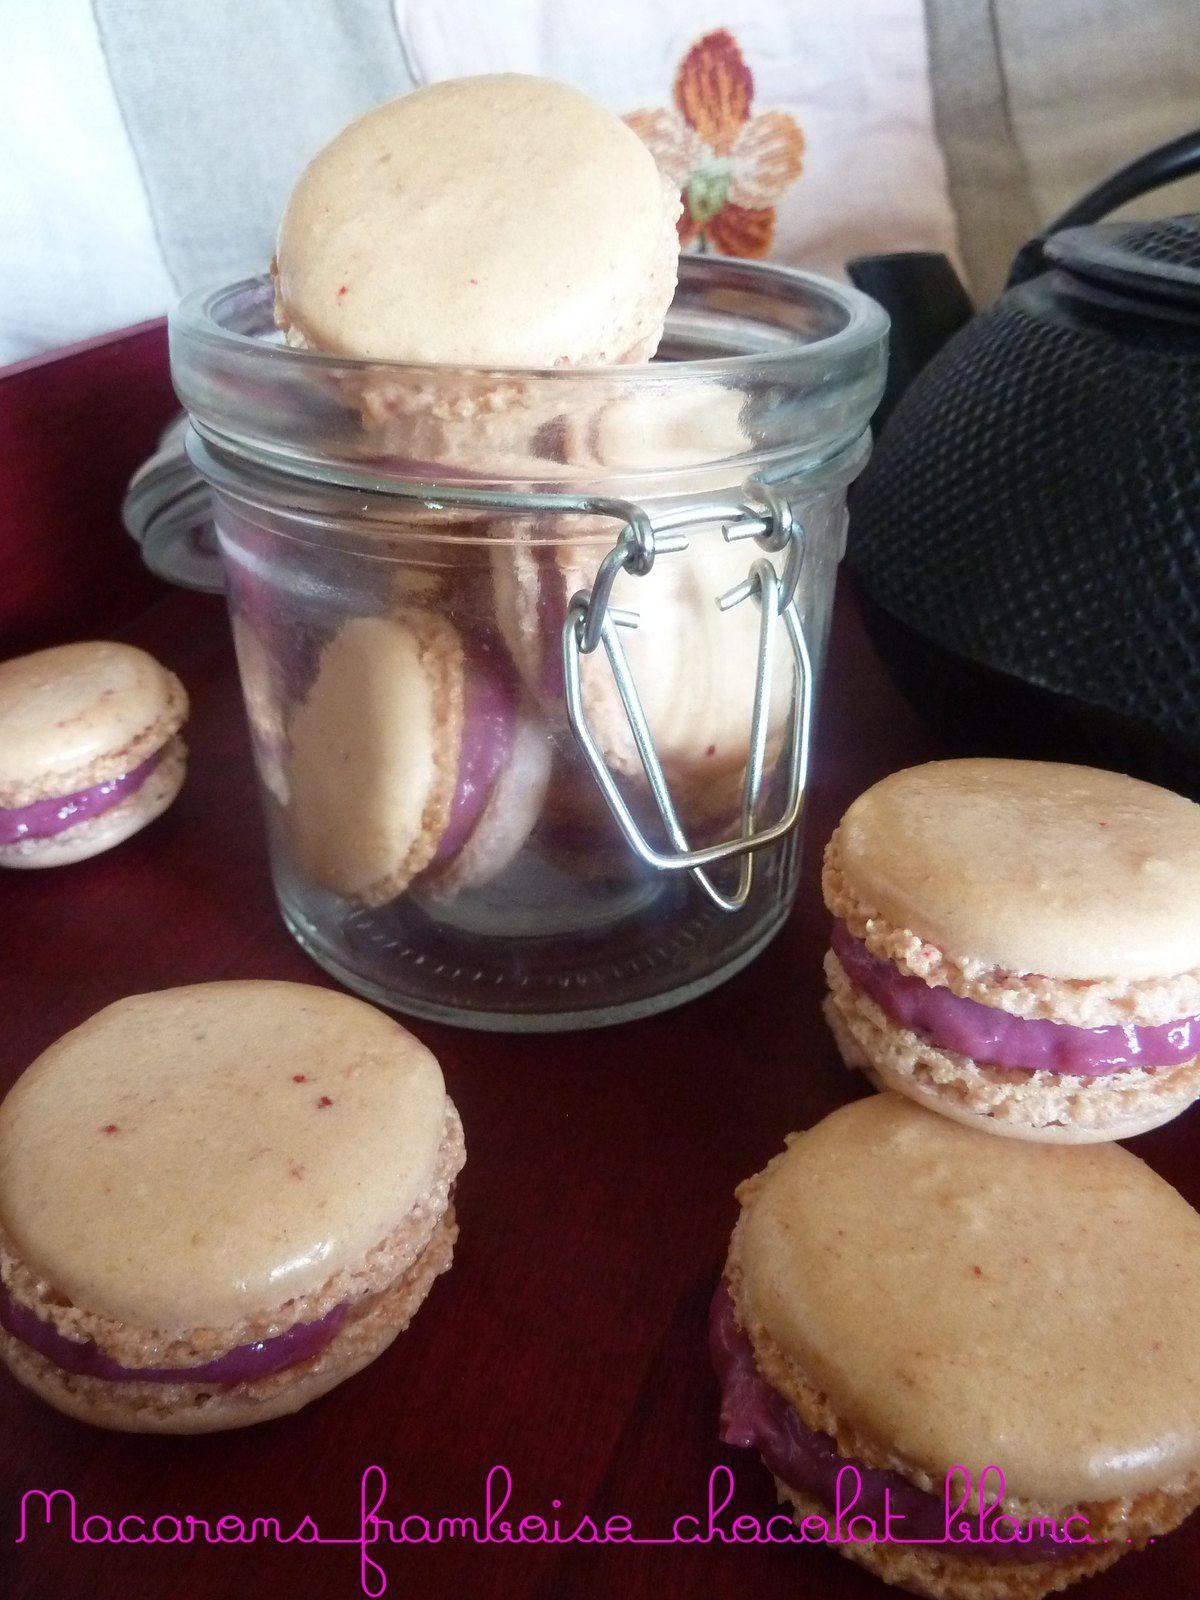 Macaron framboise et chocolat blanc